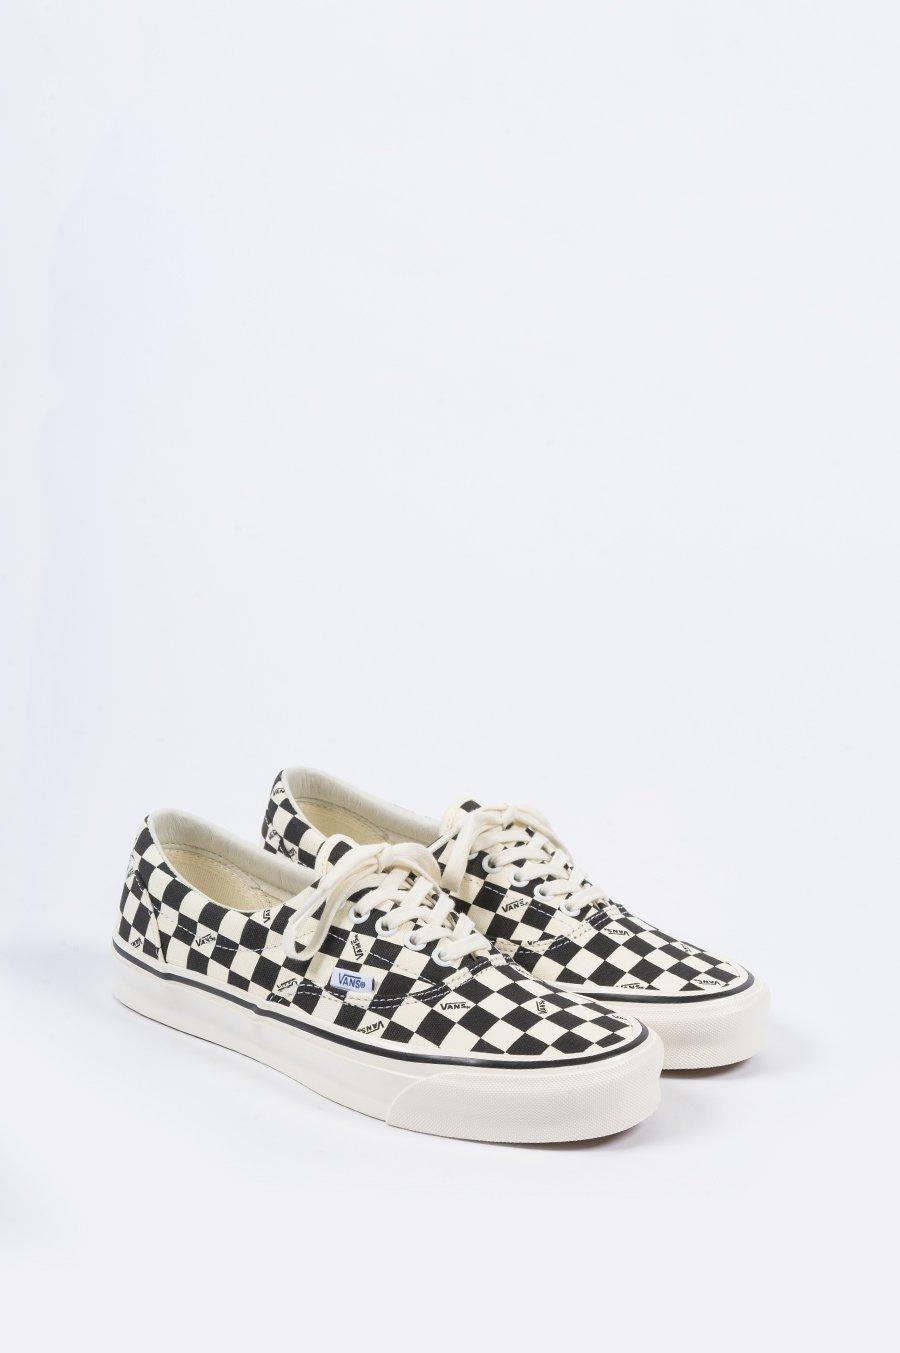 Vault By Vans – OG Era LX Checkerboard